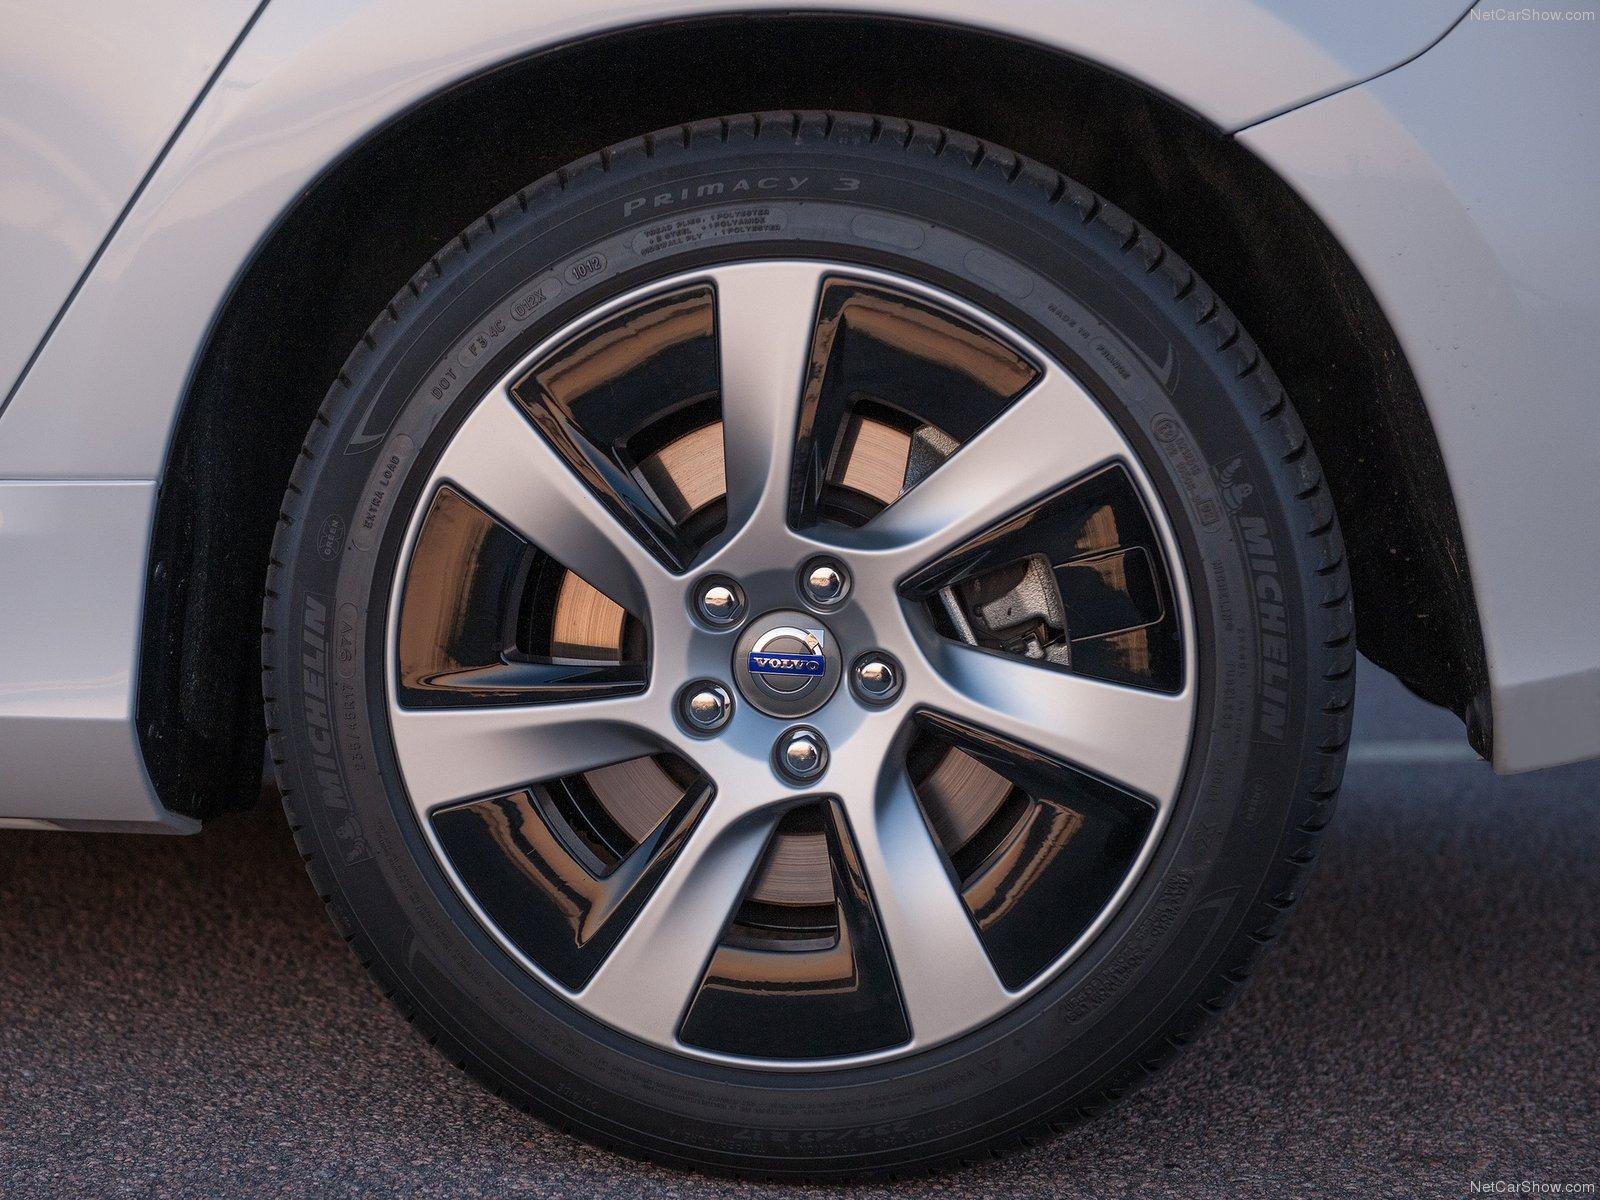 Volvo V60 Plug-in Hybrid 2014 Volvo-V60_Plug-in_Hybrid-2014-1600-22